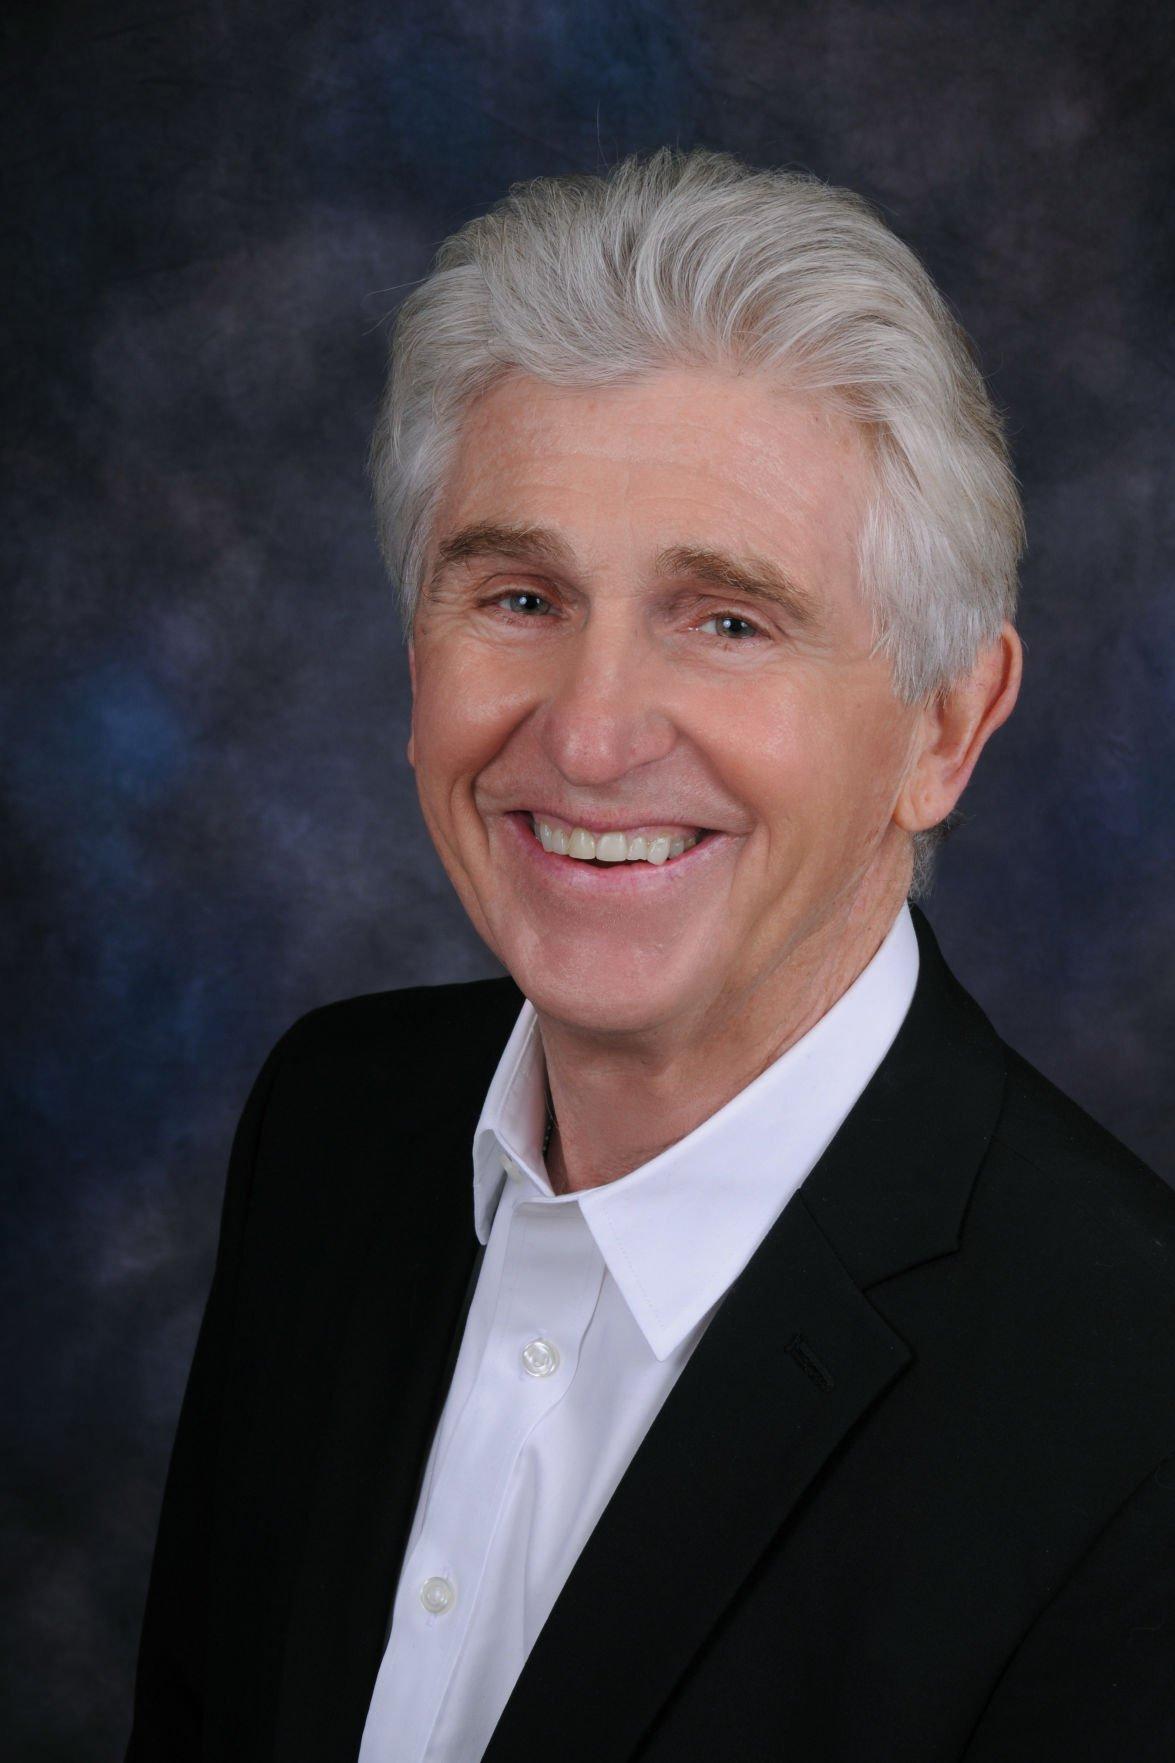 Jerry Bollig